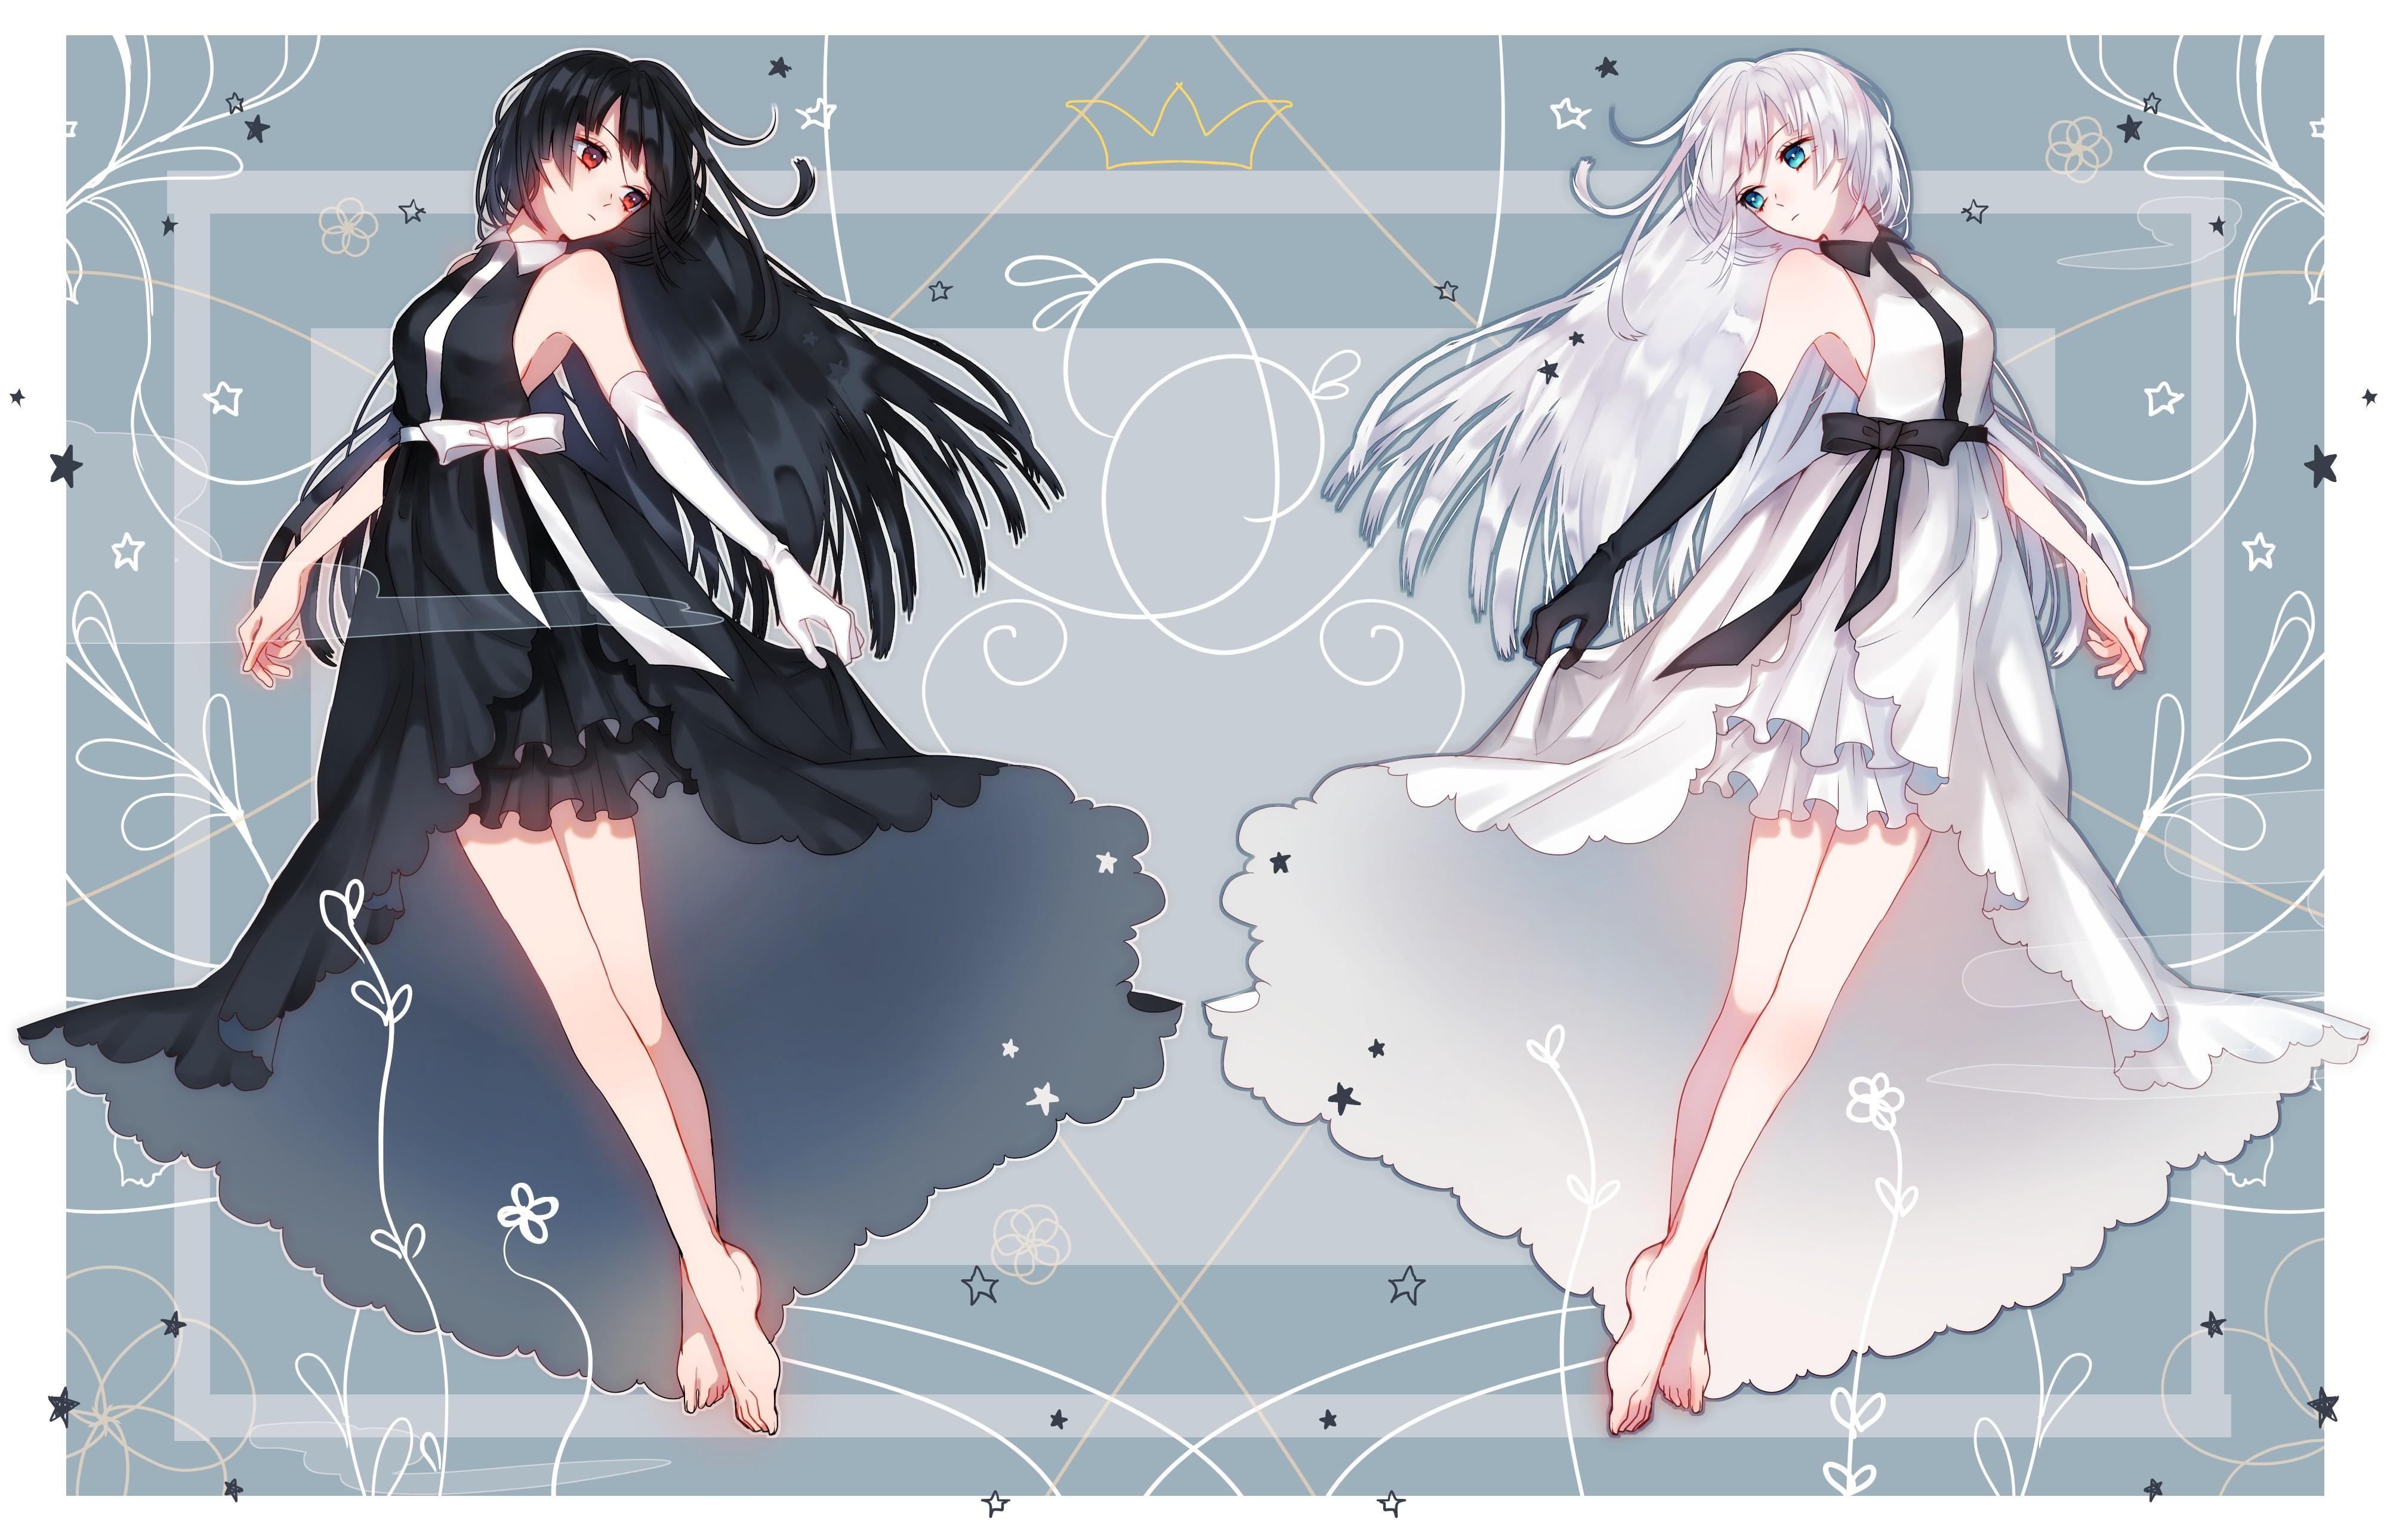 wallpaper drawing illustration long hair anime girls